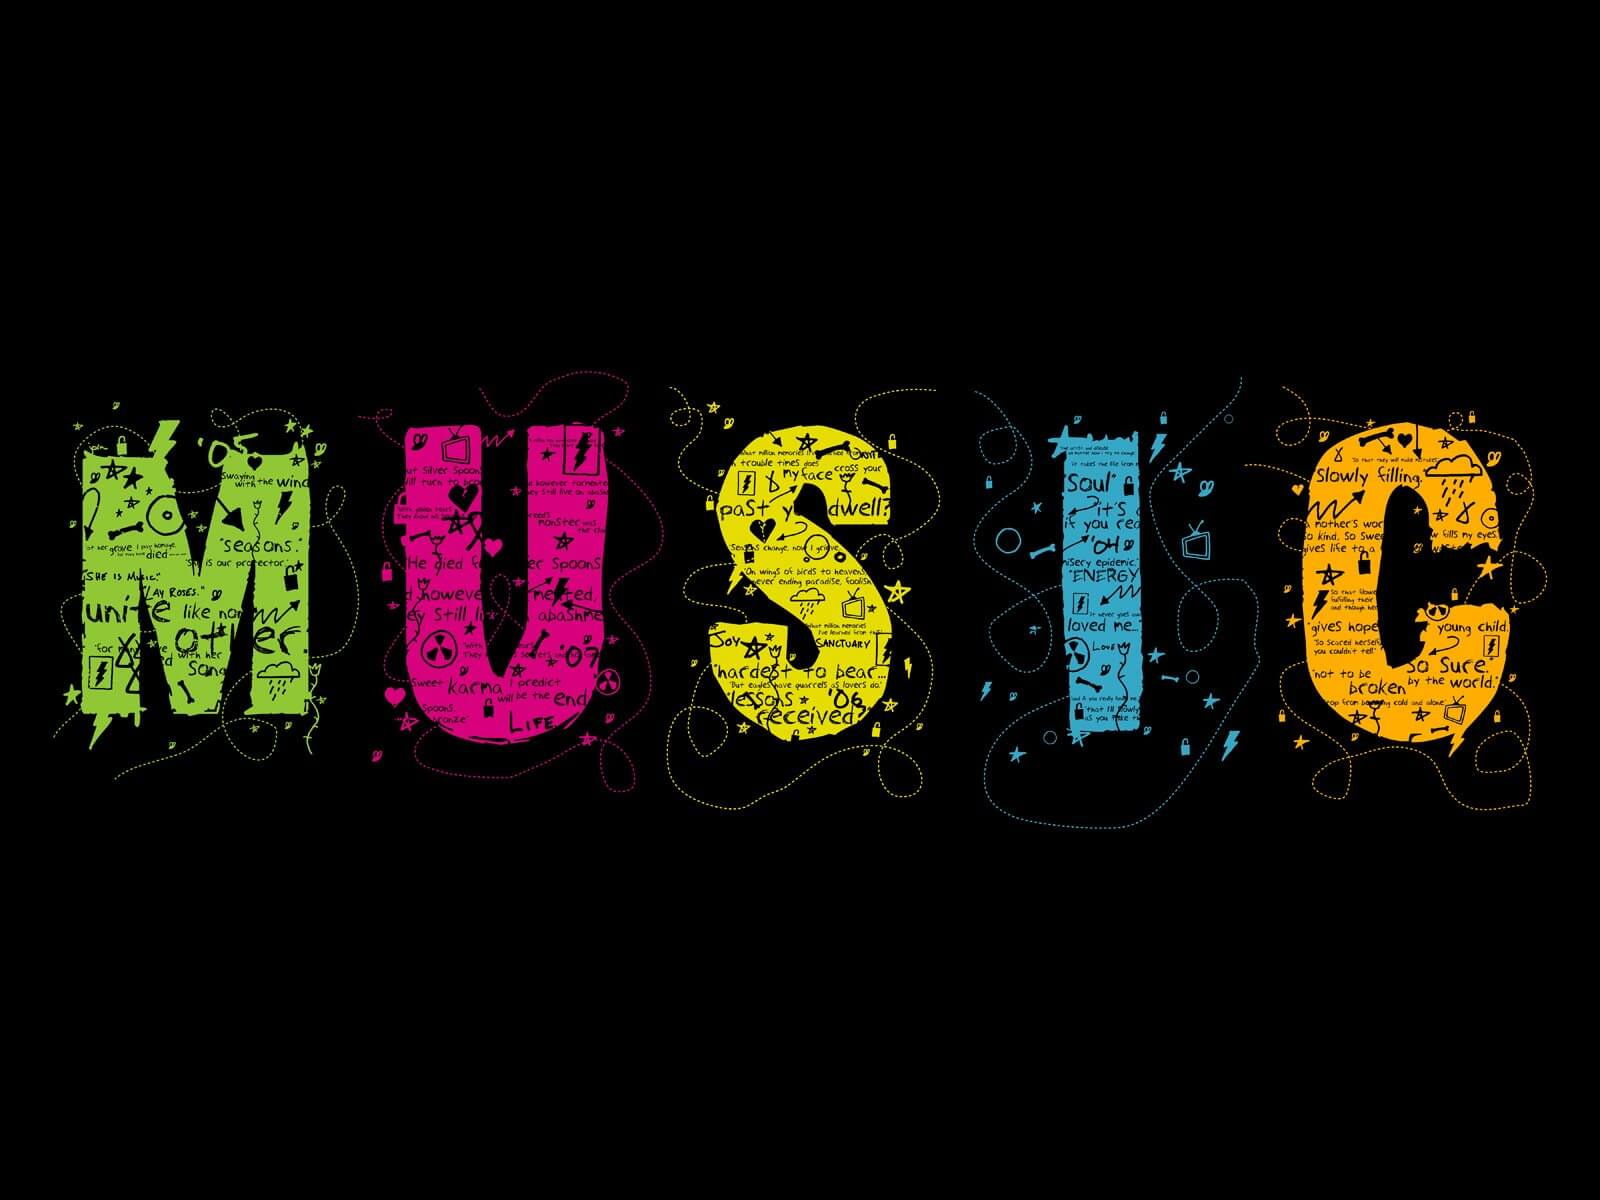 happy world music day hd desktop wallpaper